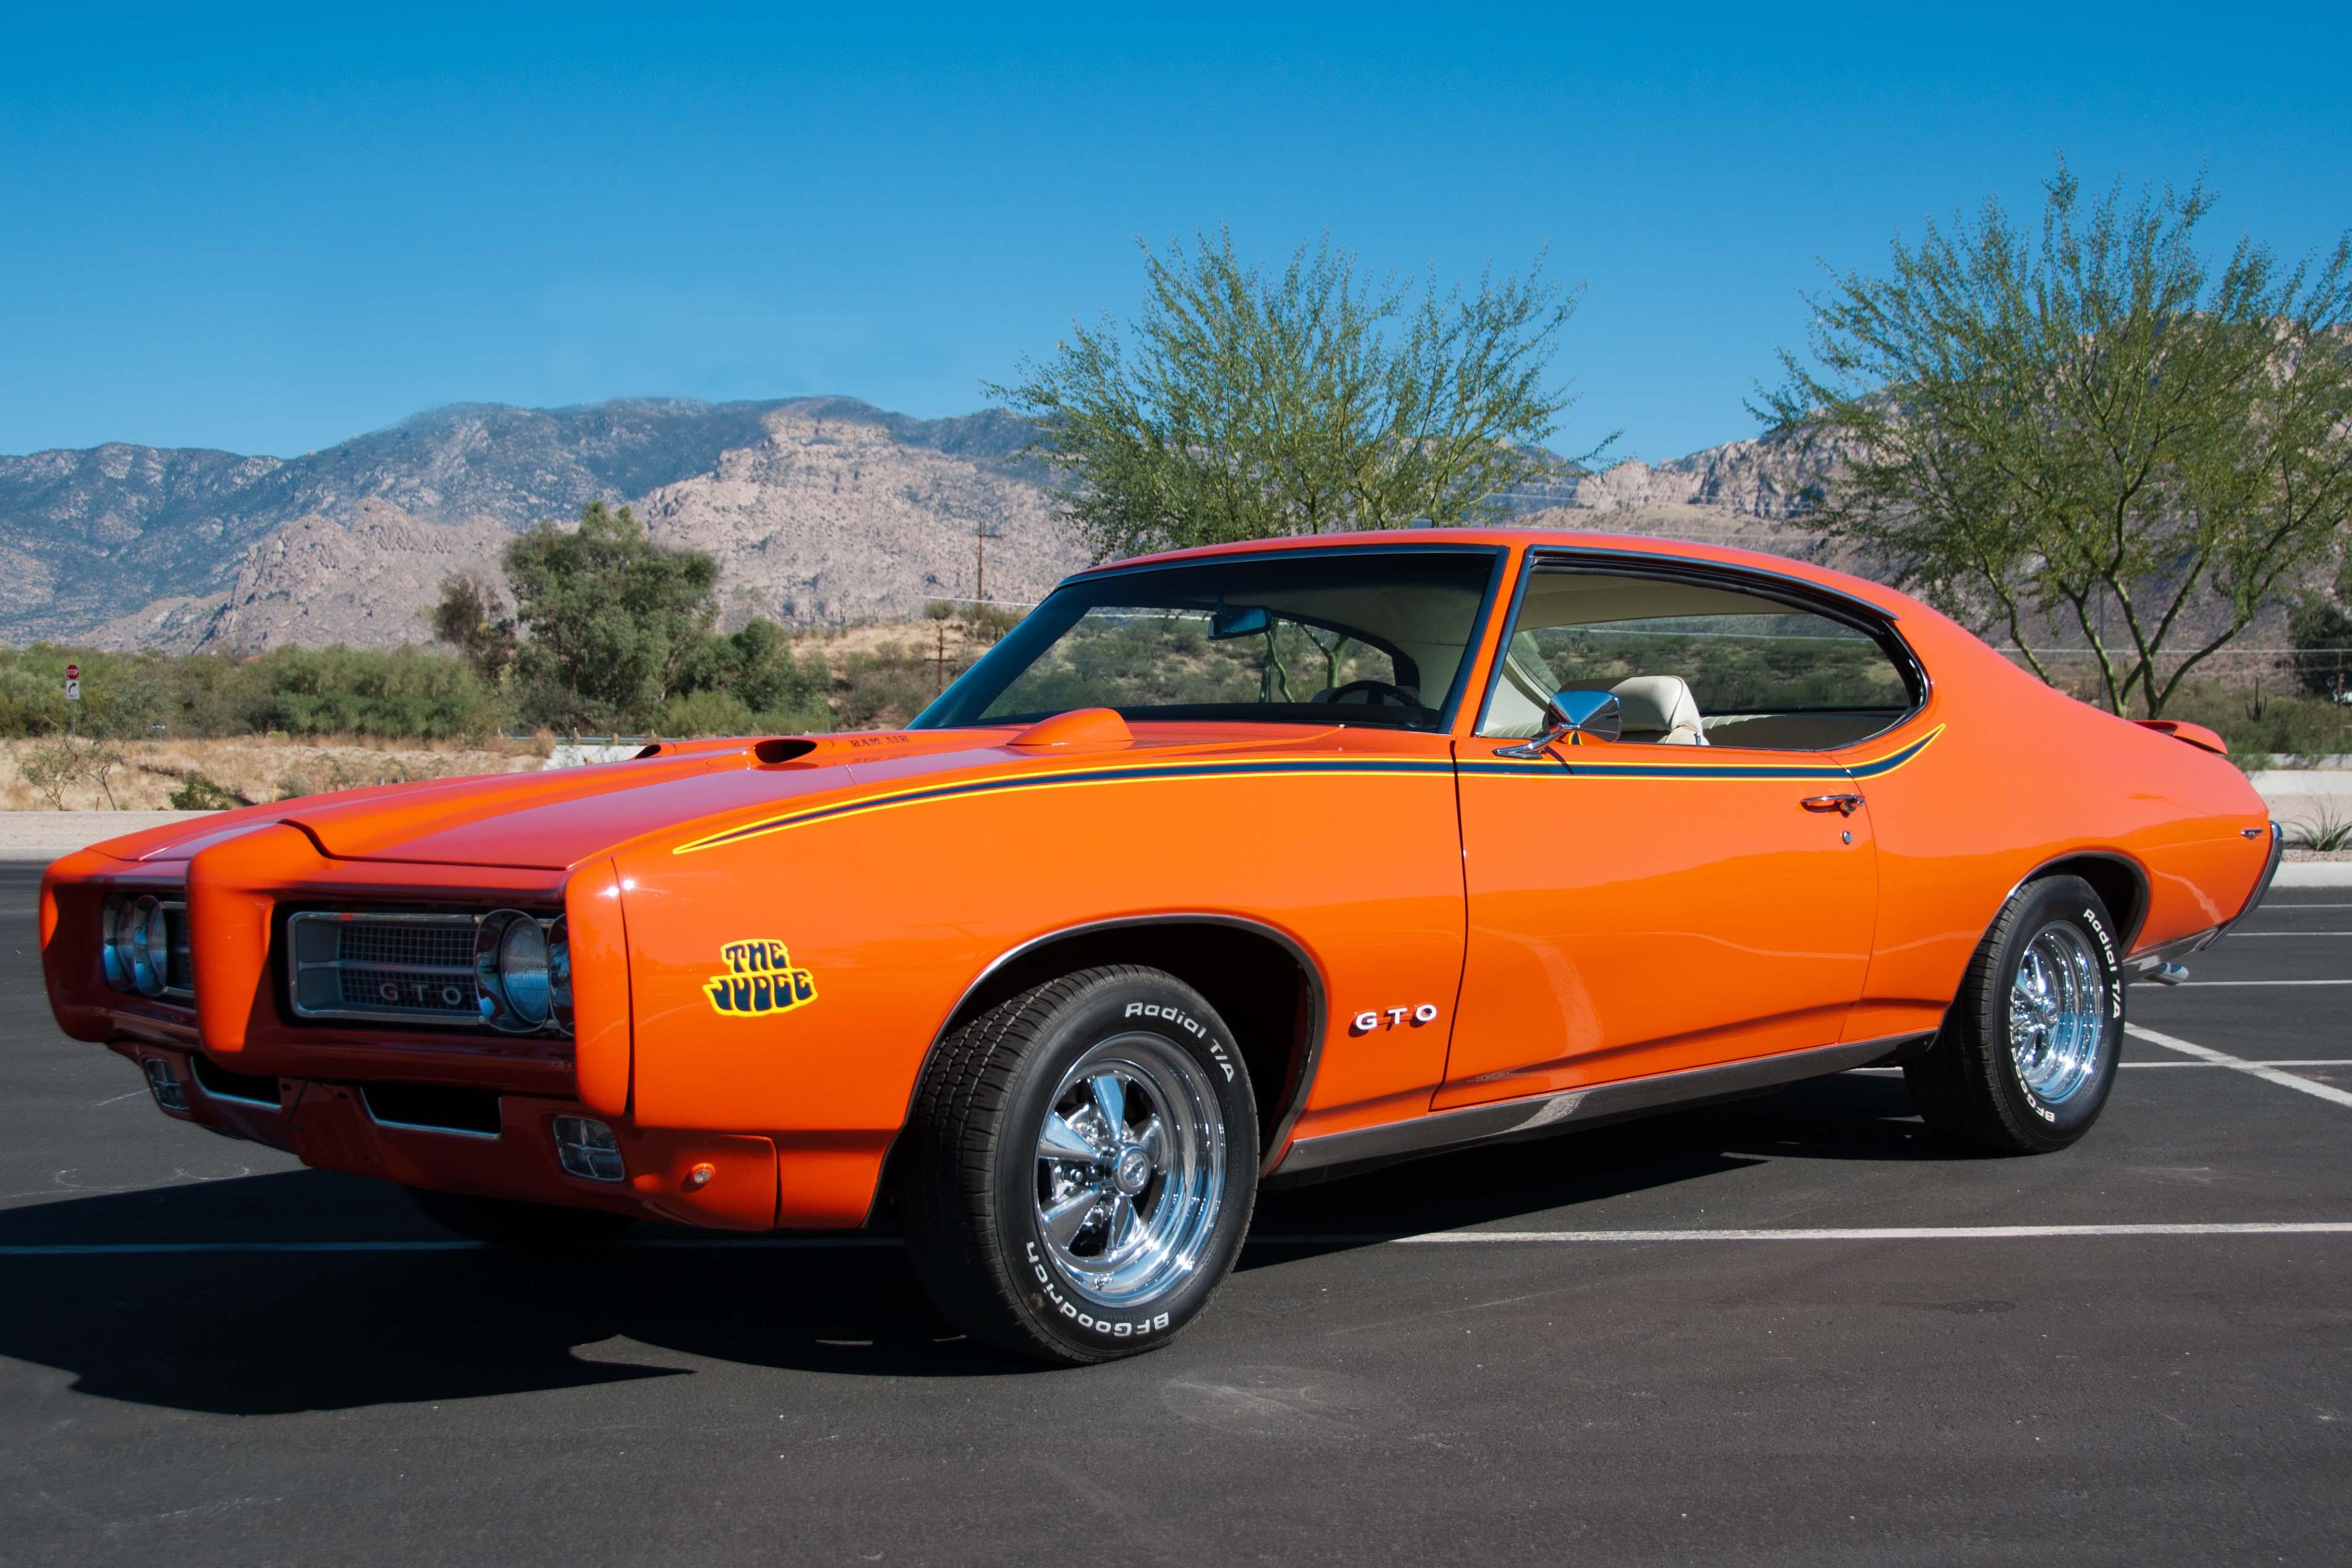 Pontiac GTO Wallpapers 3807x2538